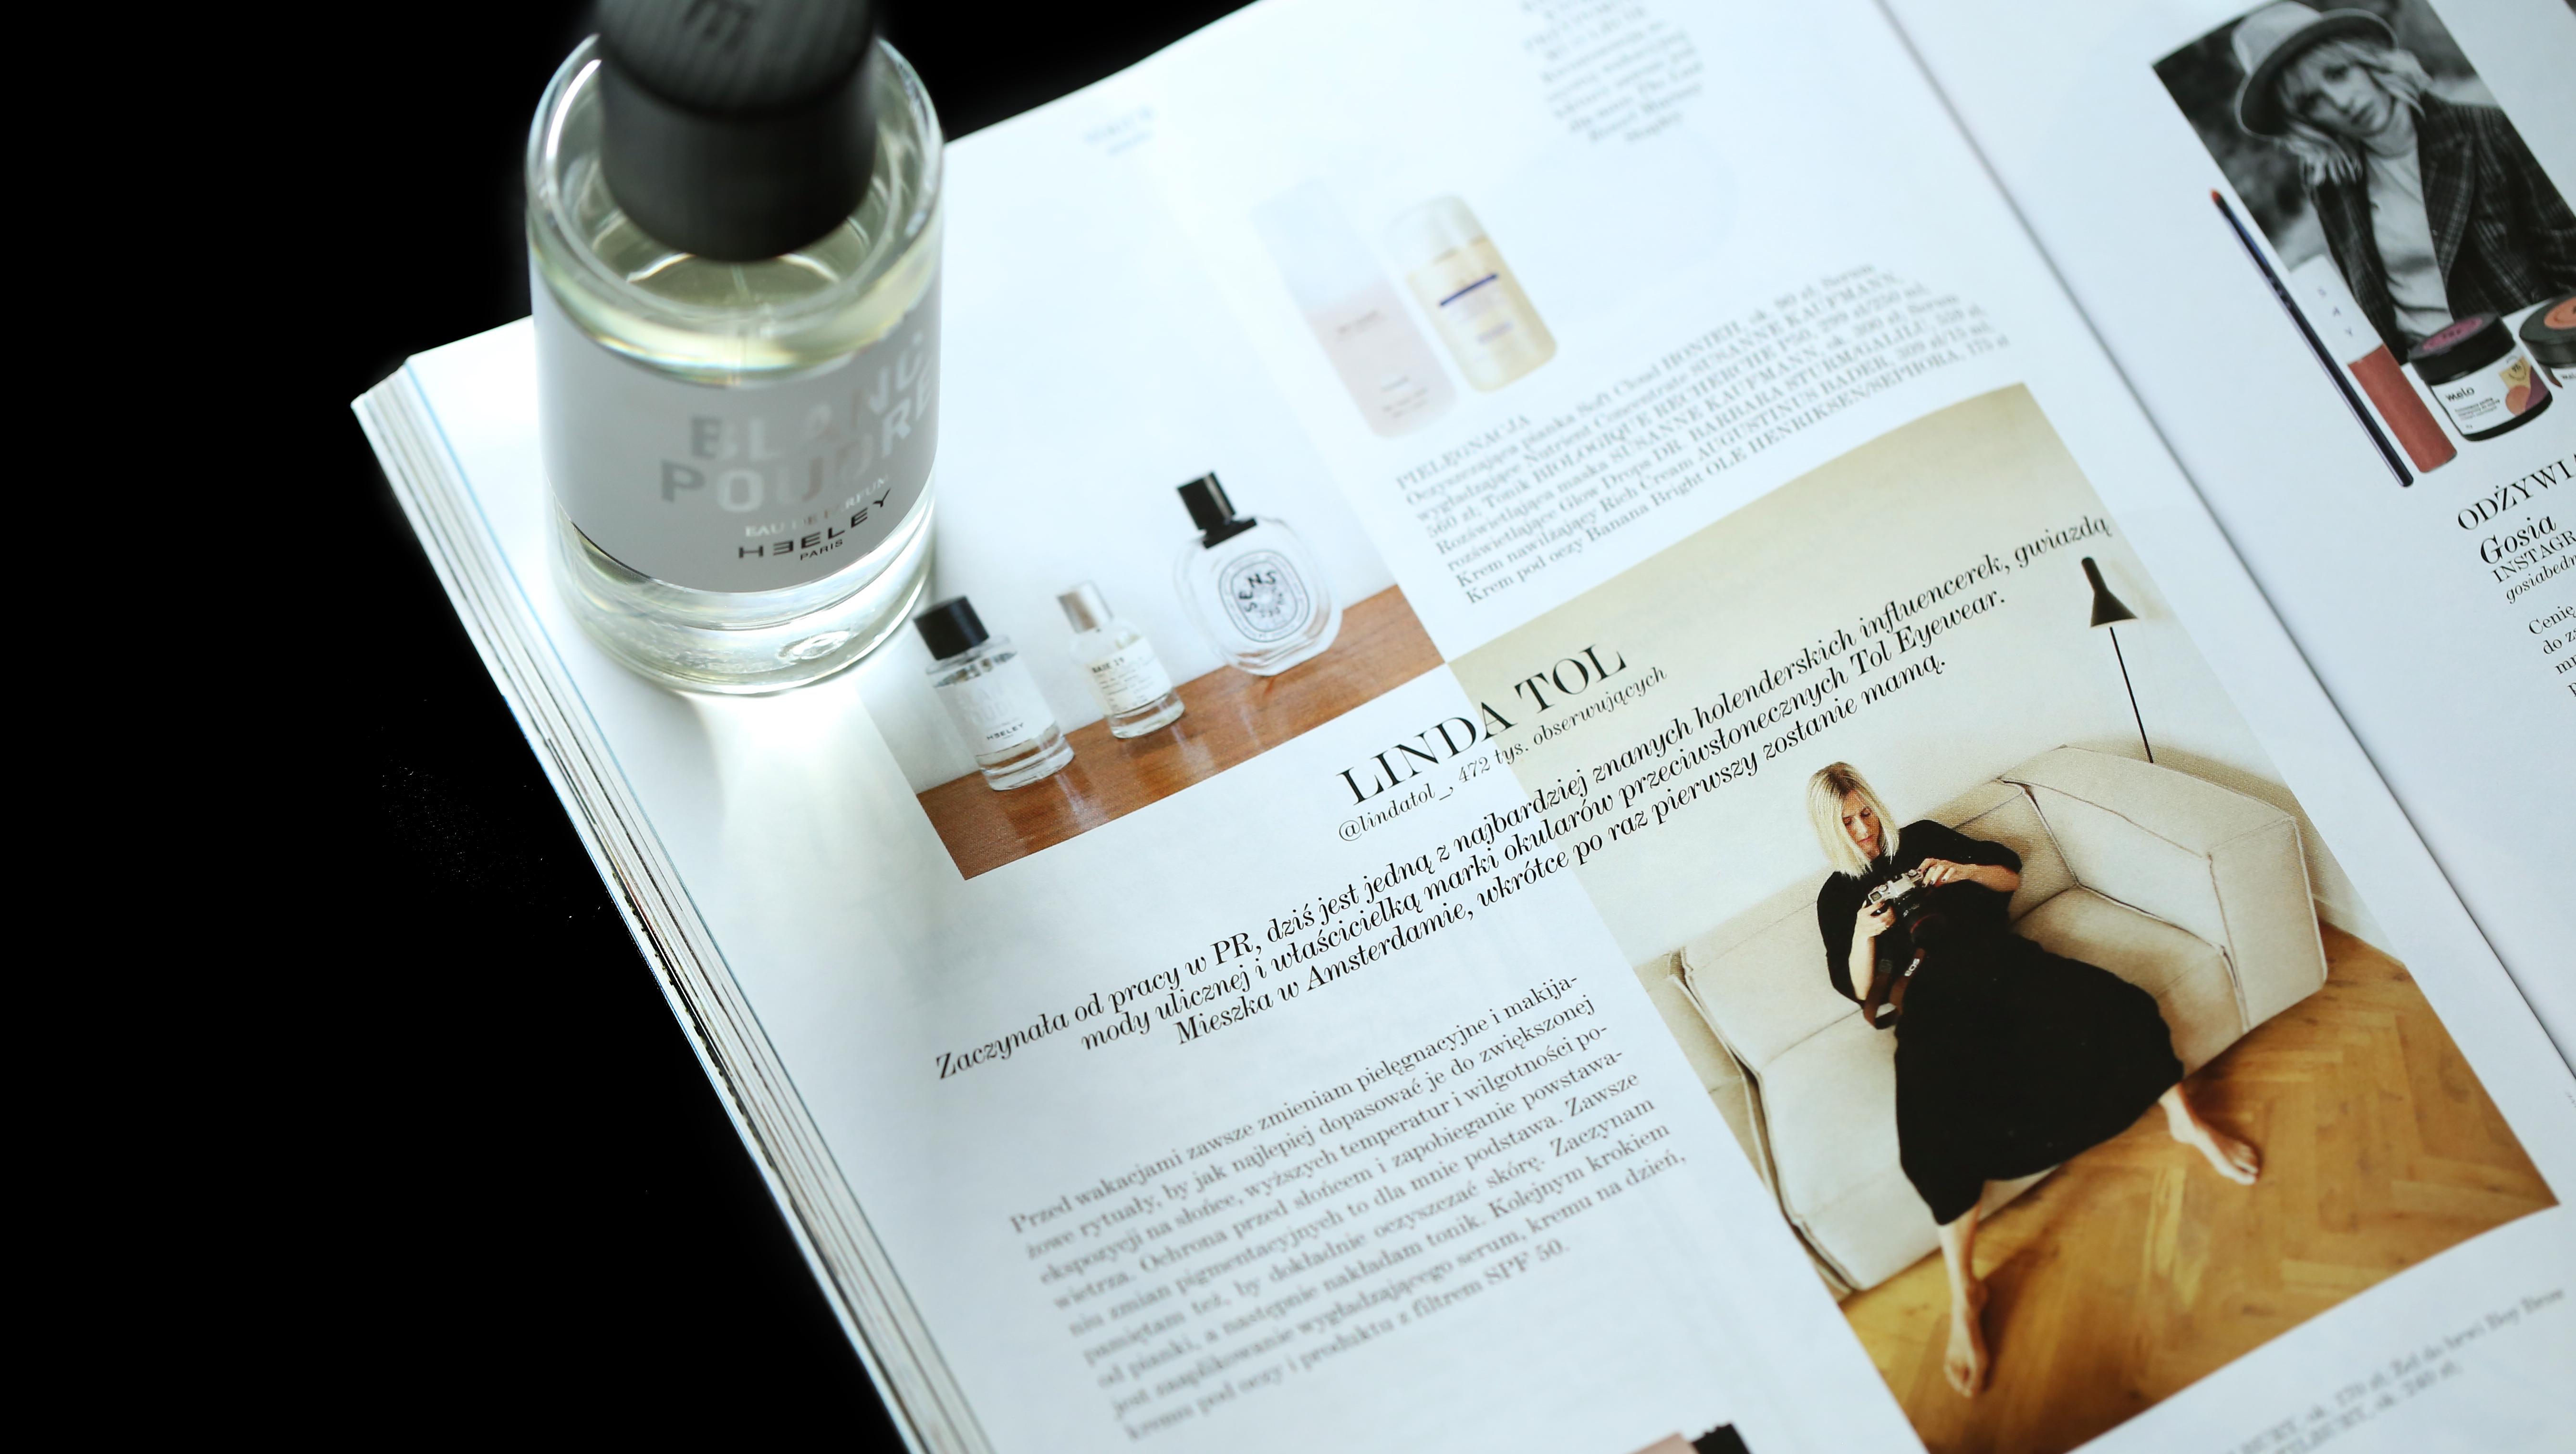 Heeley Blanc Poudre x Vogue Polska